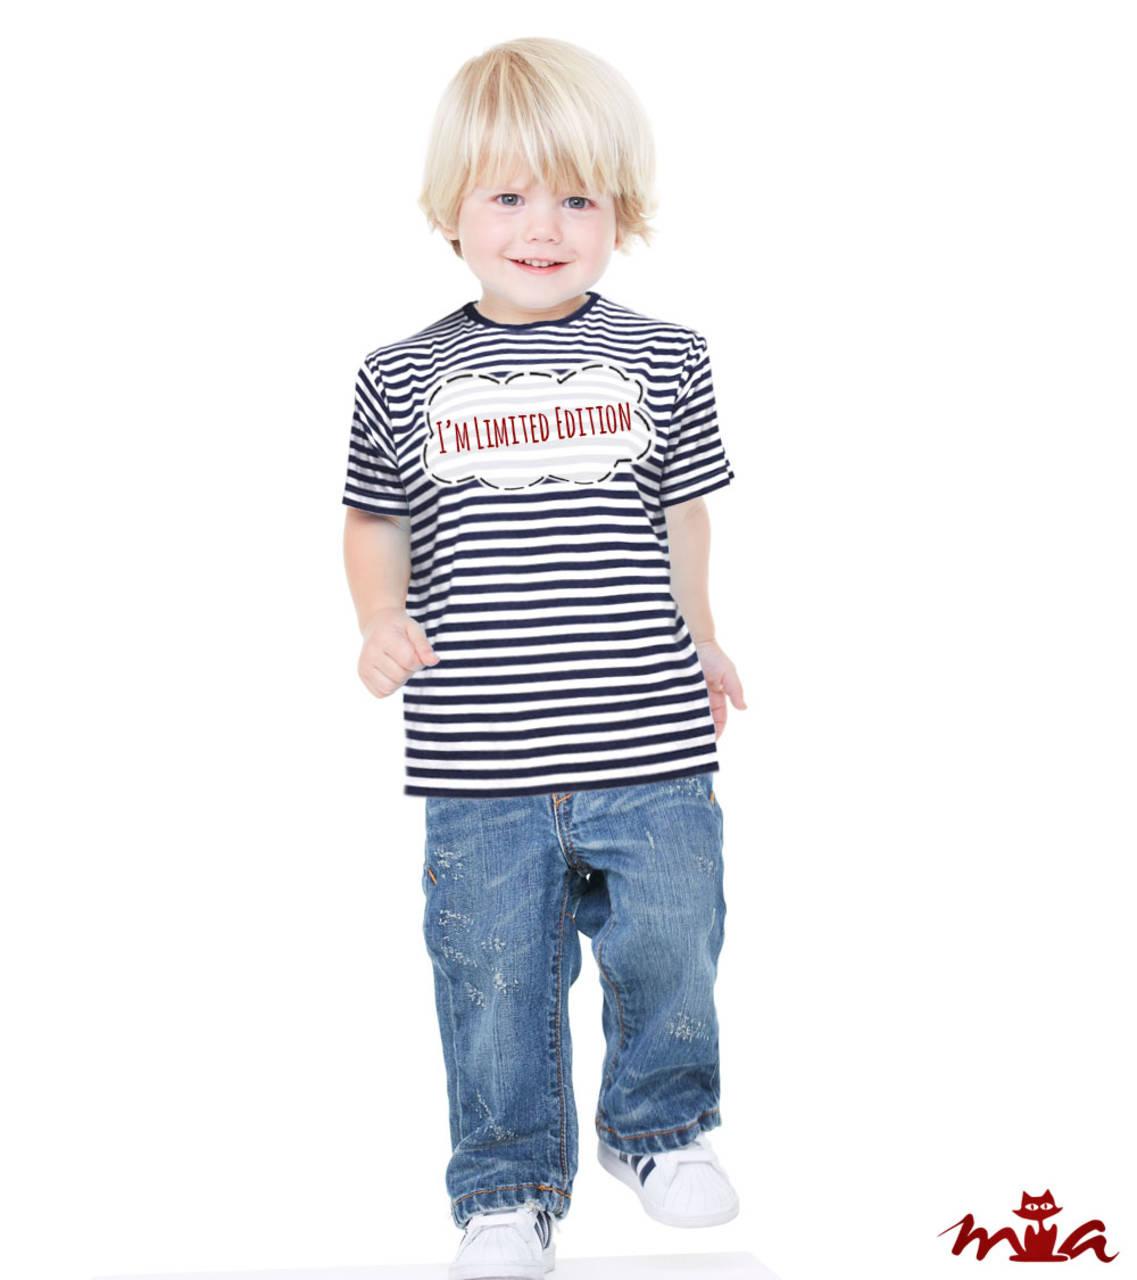 93819f1bc32 ... Detské oblečenie - Detské námornícke tričko s vlastným nápisom -  8170925  ...